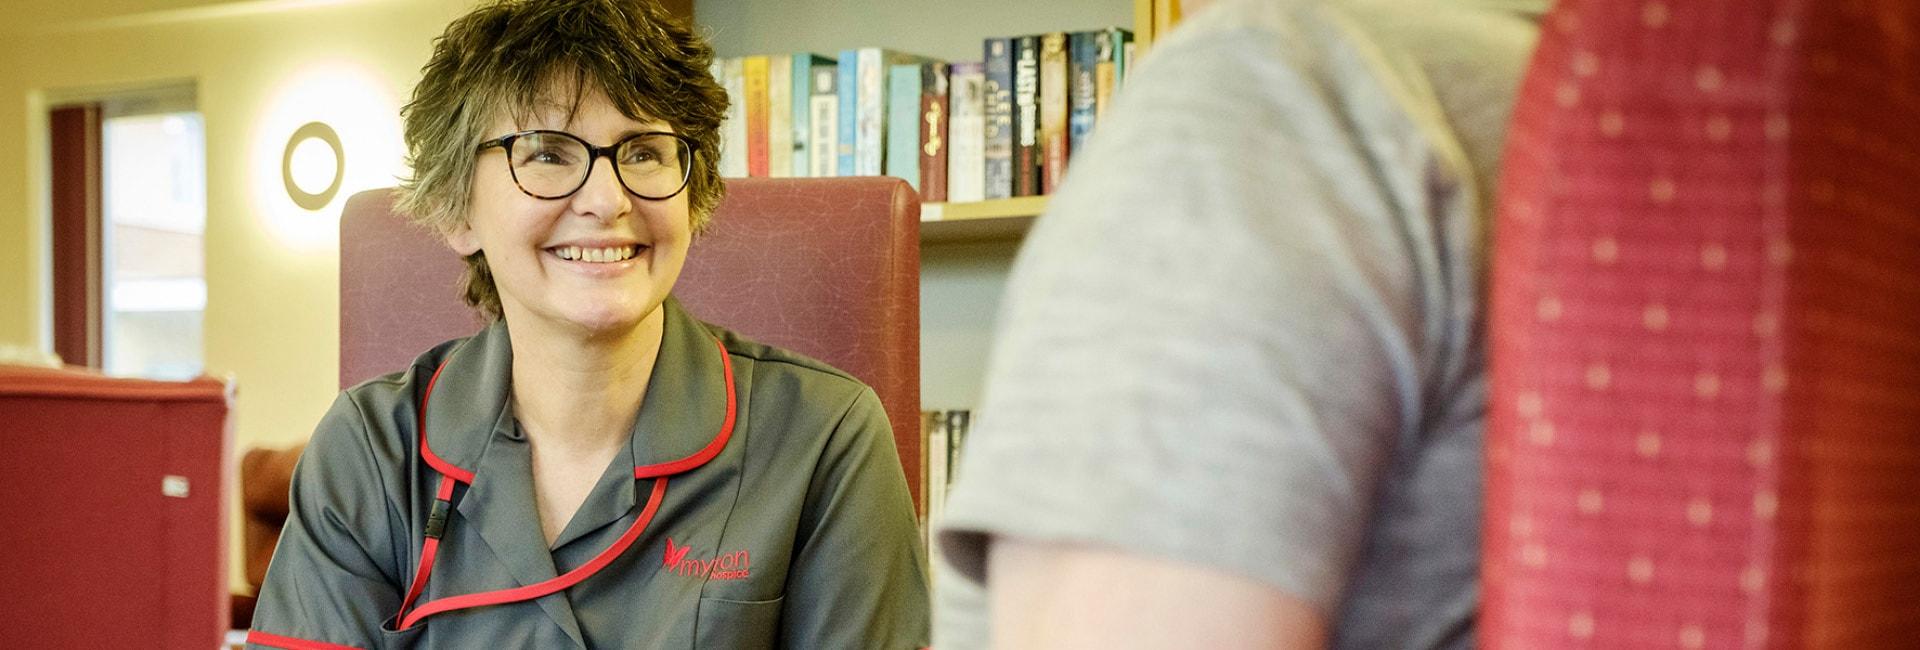 The Myton Hospices - Coventry Nurse - Flex Slider